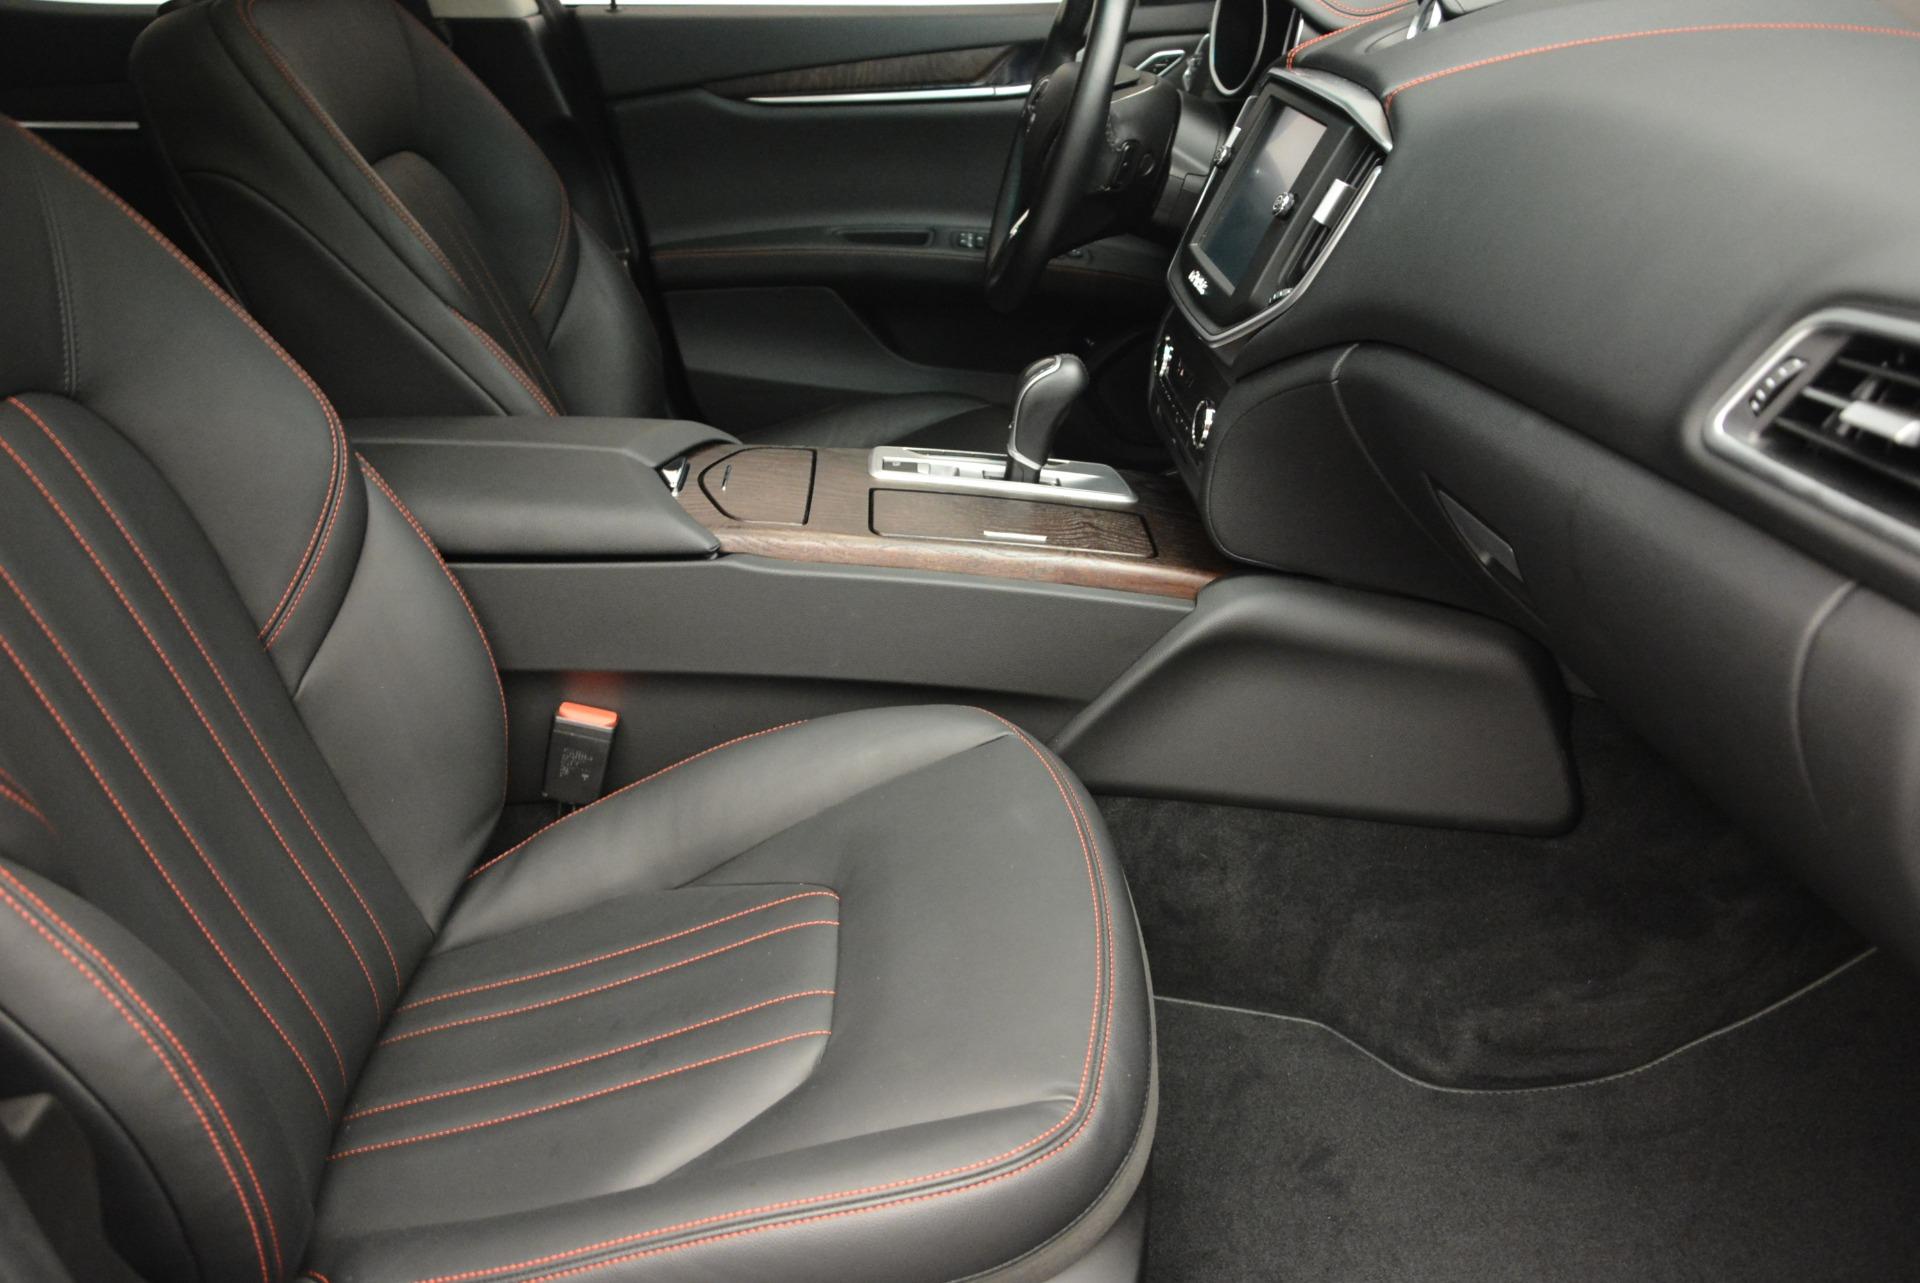 Used 2016 Maserati Ghibli S Q4  EX- LOANER For Sale In Westport, CT 668_p20